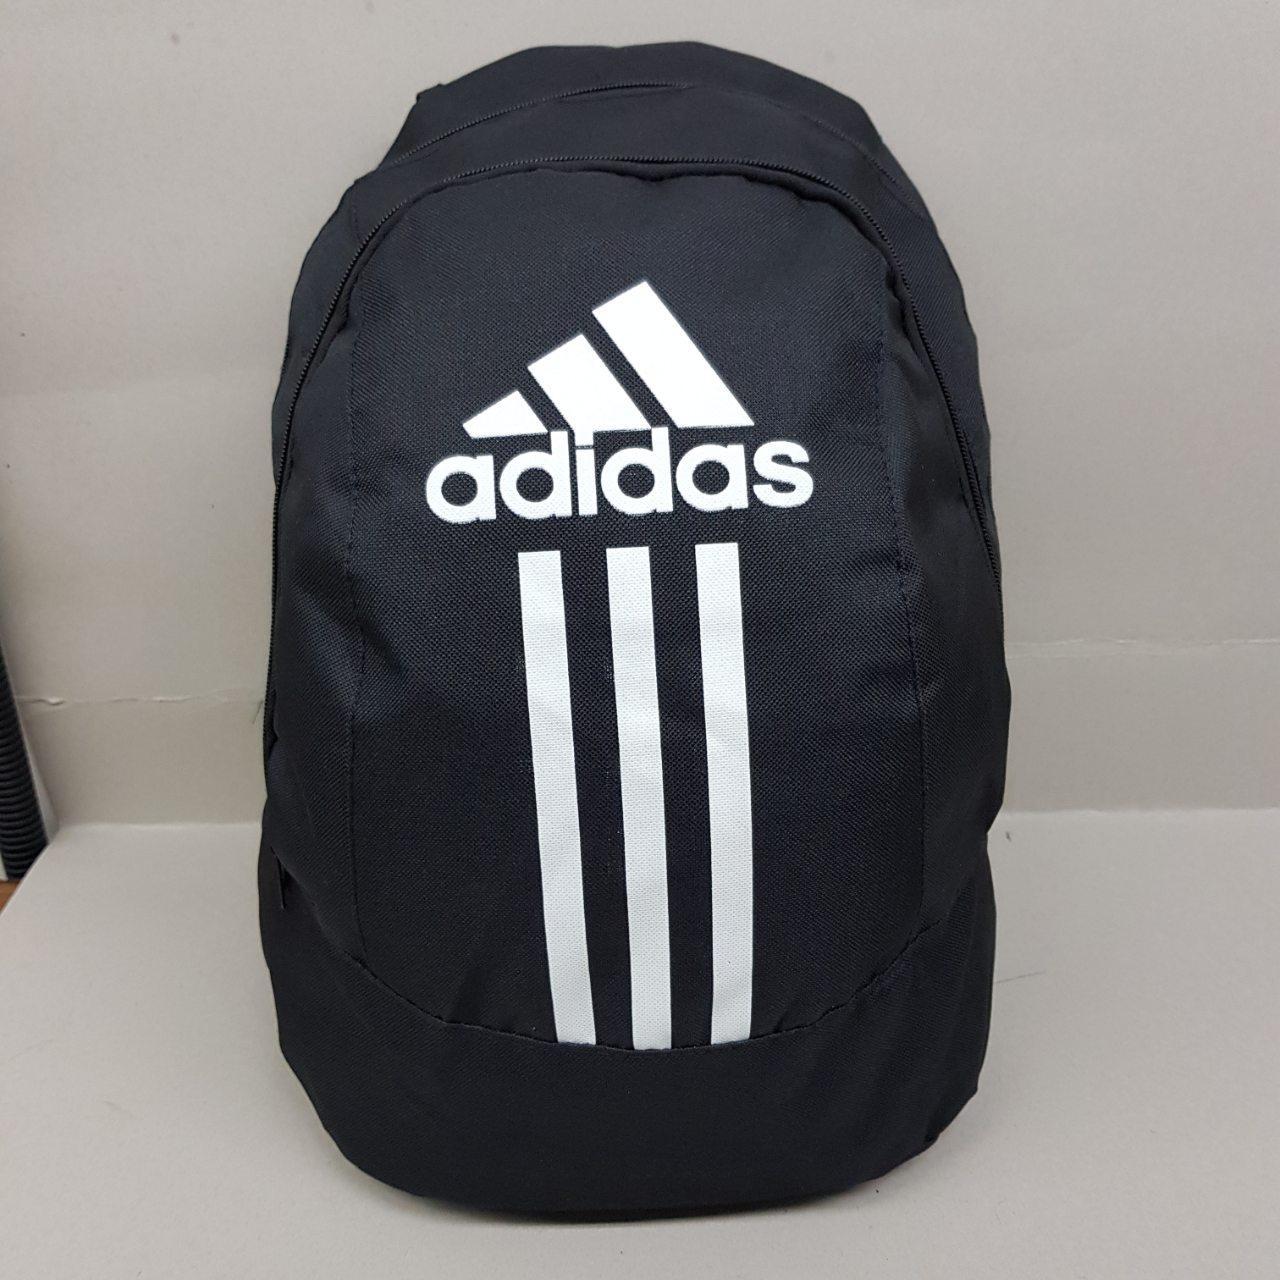 9cfebfb6a9c0 Рюкзак молодежный, рюкзак спортивный, сумки оптом, рюкзак от производителя.